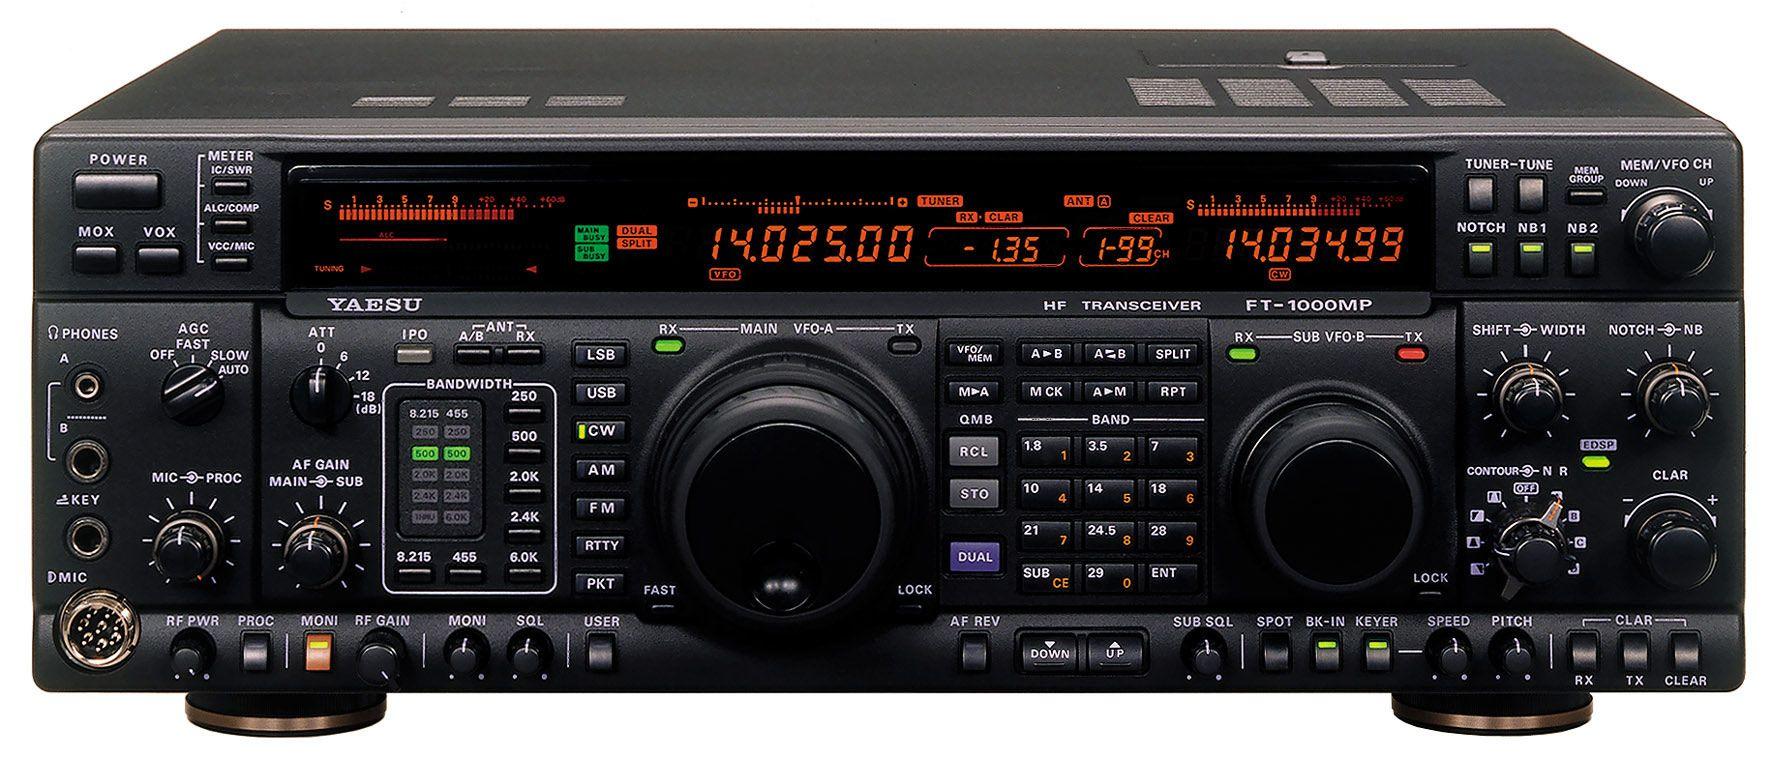 yaesu ft1000 - Google Search Yaesu Radio, Ham Radio, Hams, Radios, Circuit